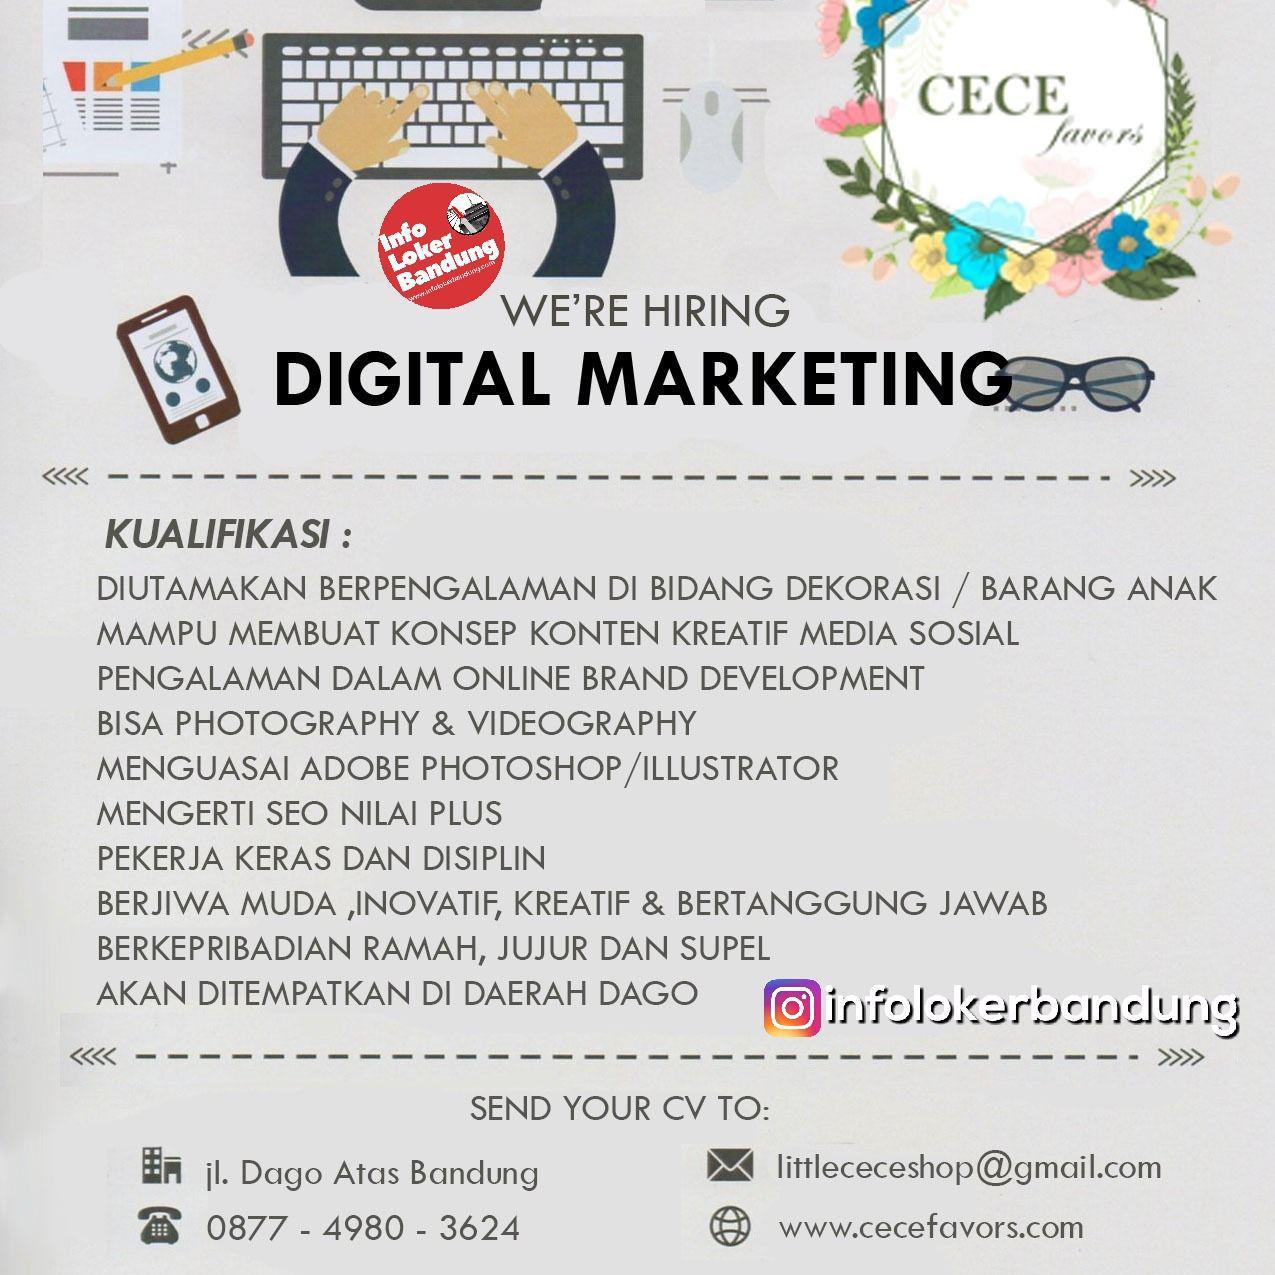 Lowongan Kerja Digital Marketing Cecefavours Bandung Januari 2019